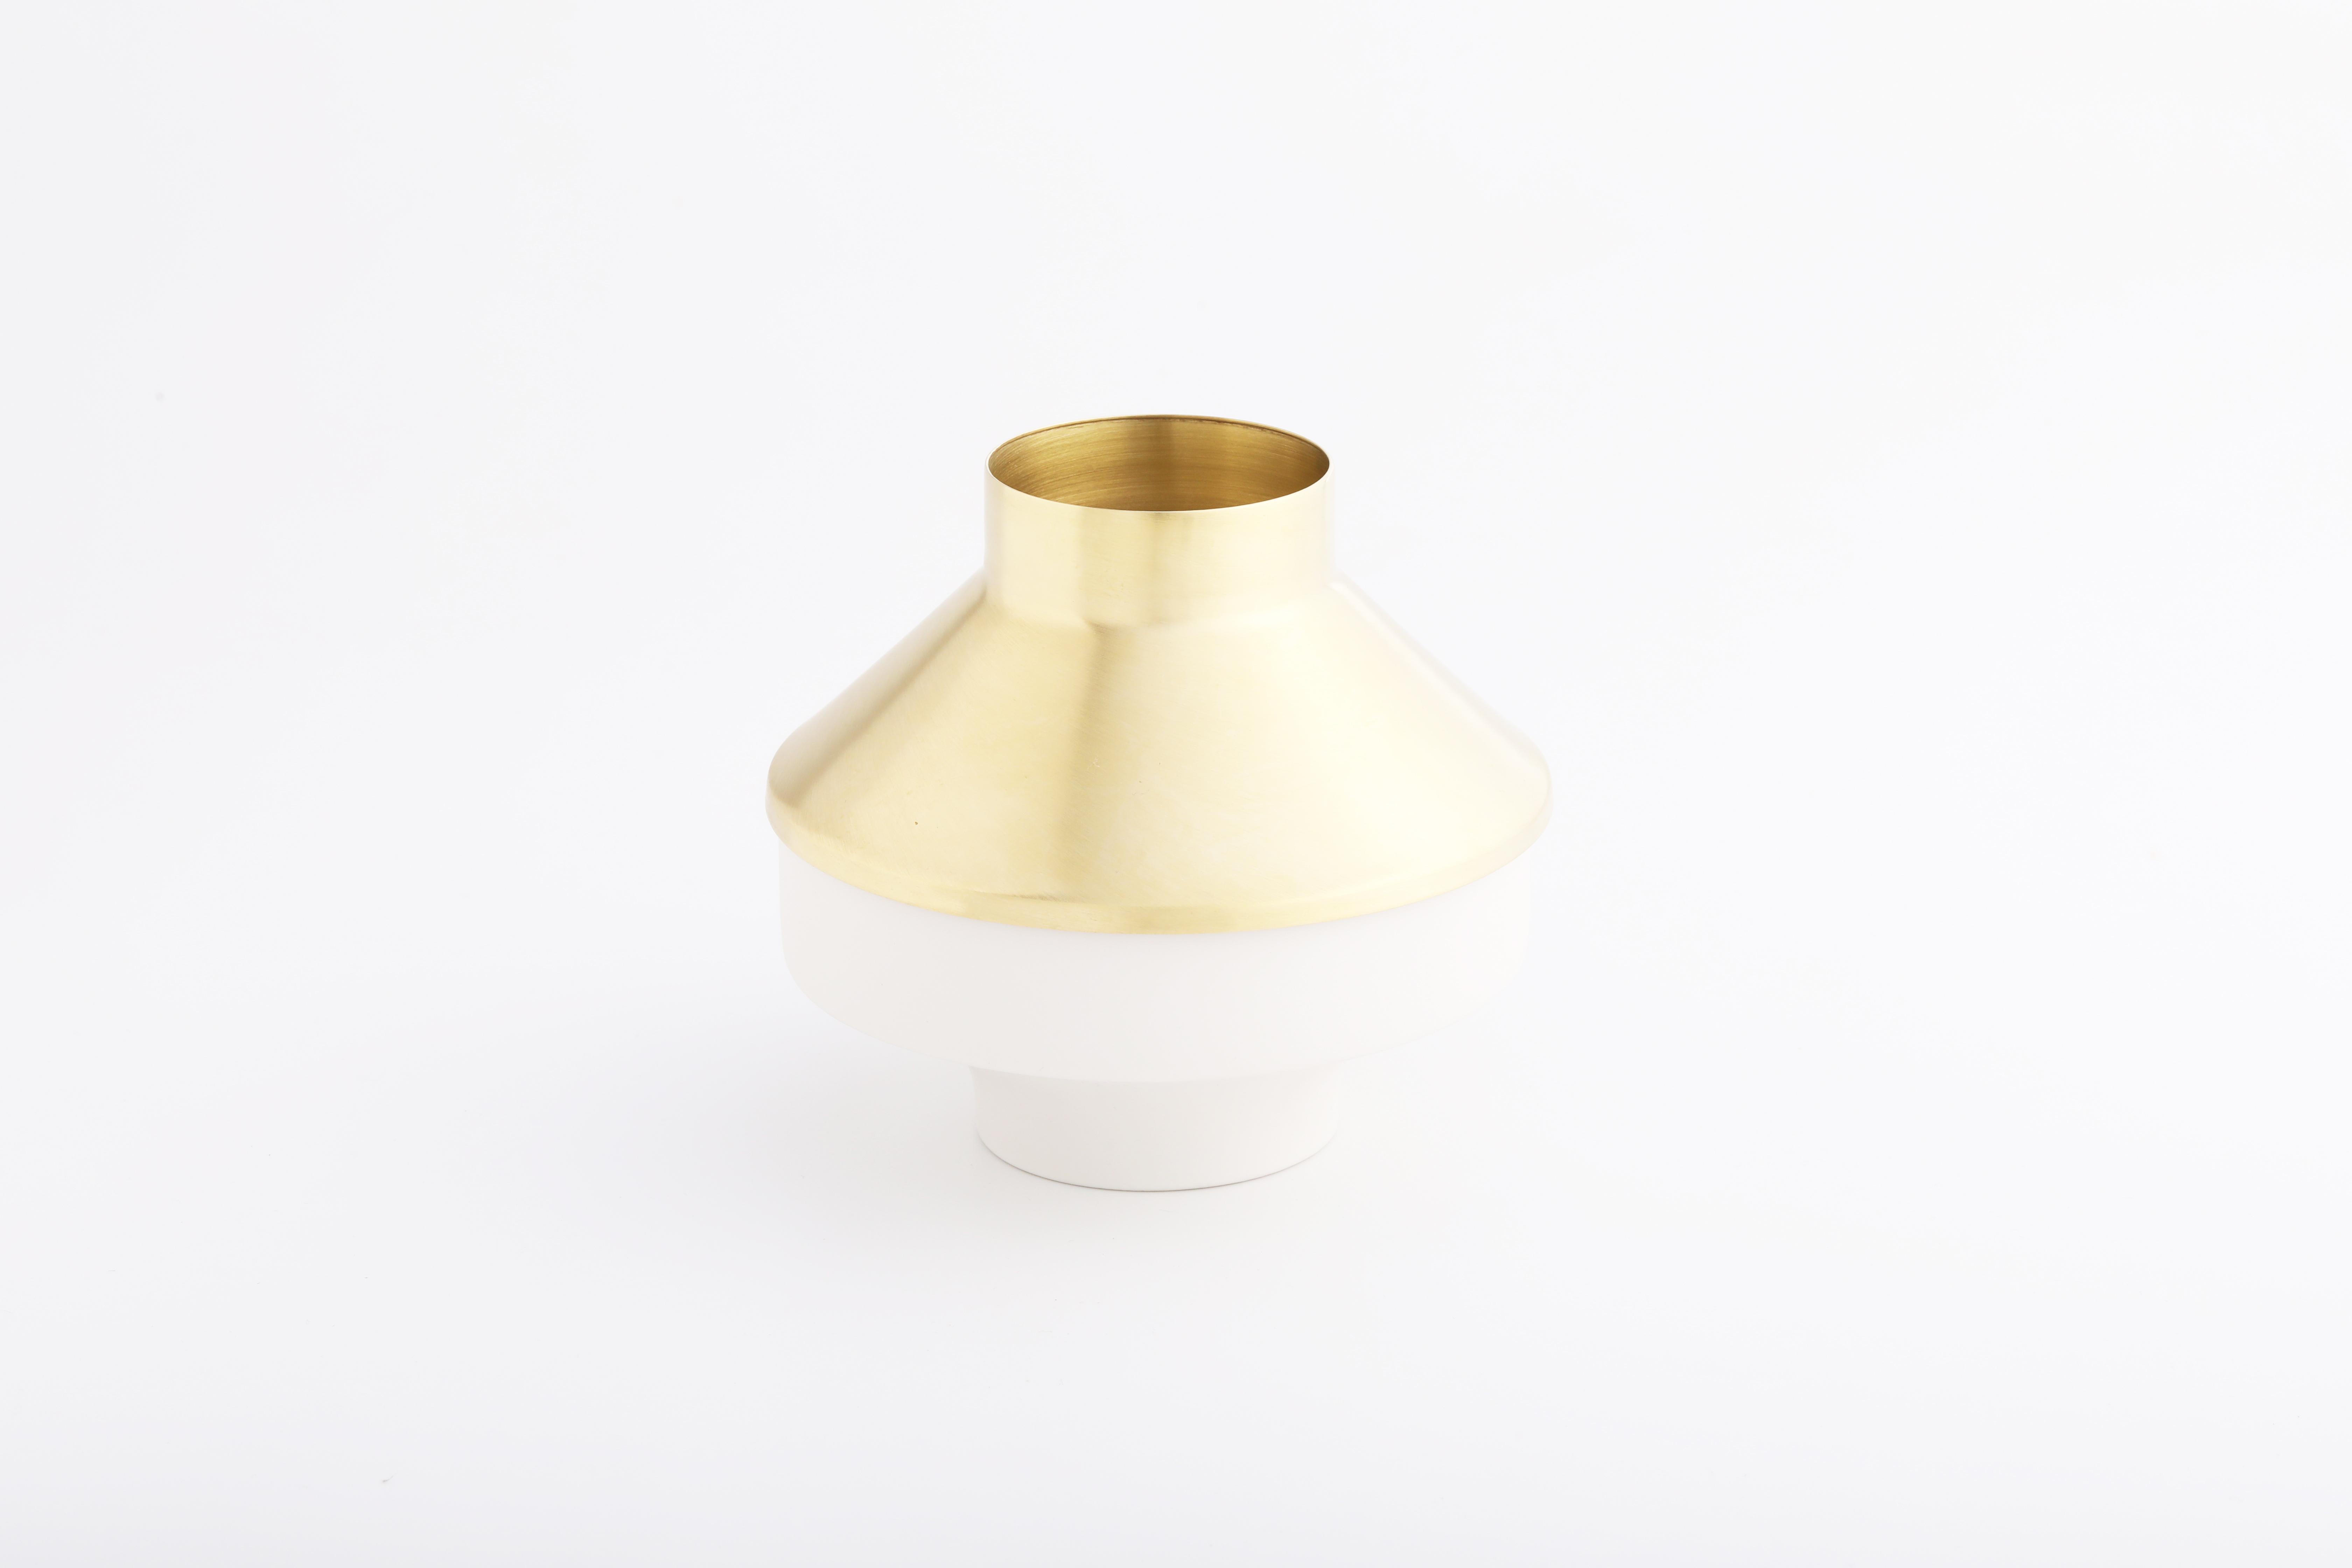 Set 8 (白瓷黃銅款 / White,Brass)